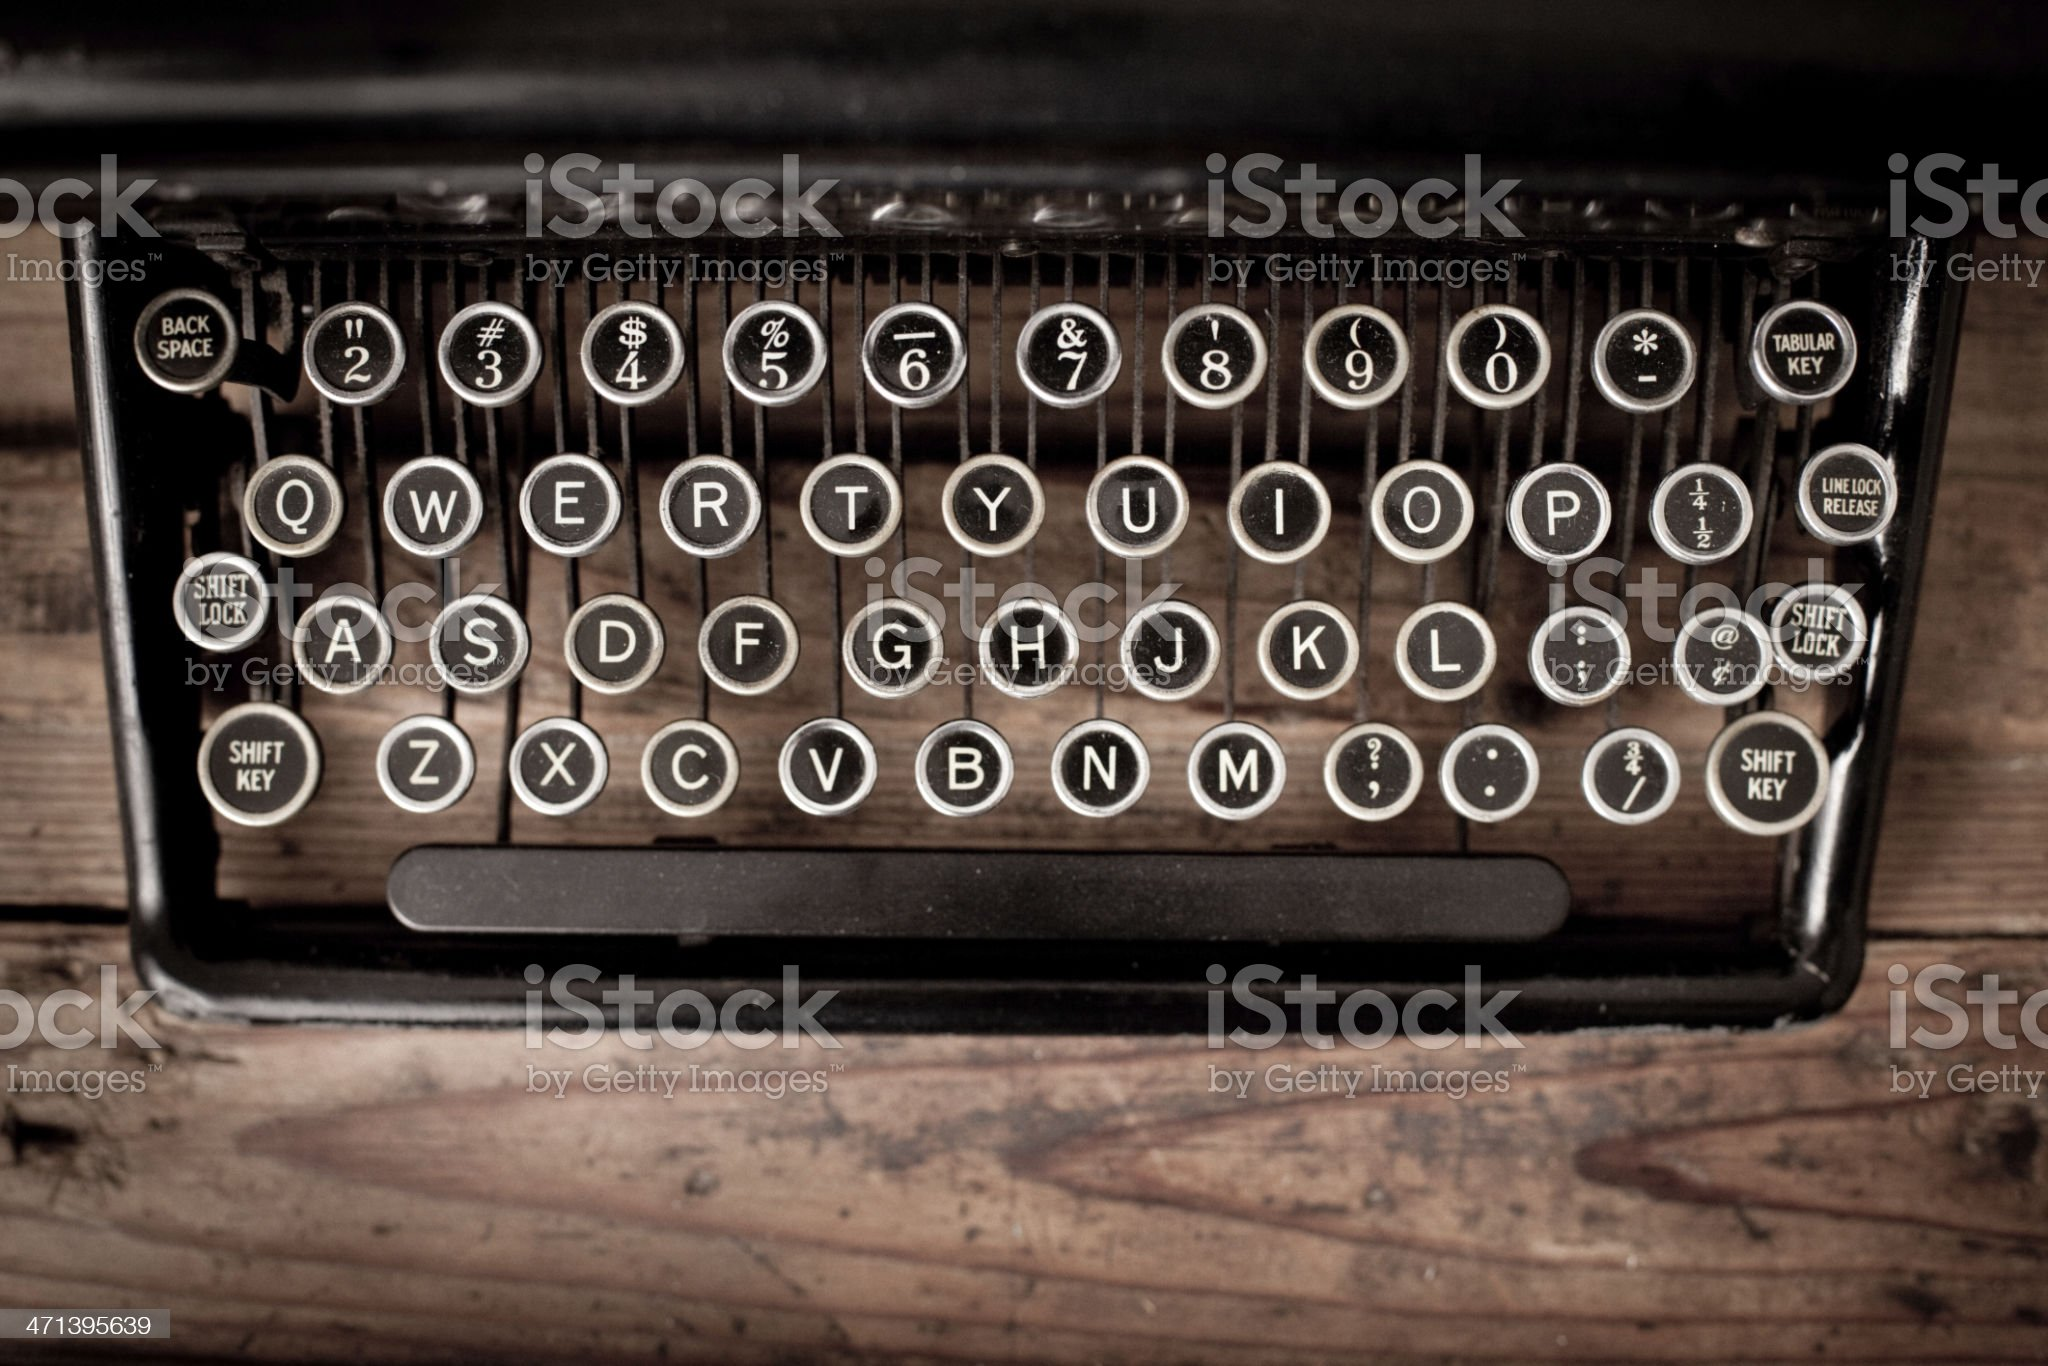 Keys of Vintage, Black, Manual Typewriter on Wood Trunk royalty-free stock photo